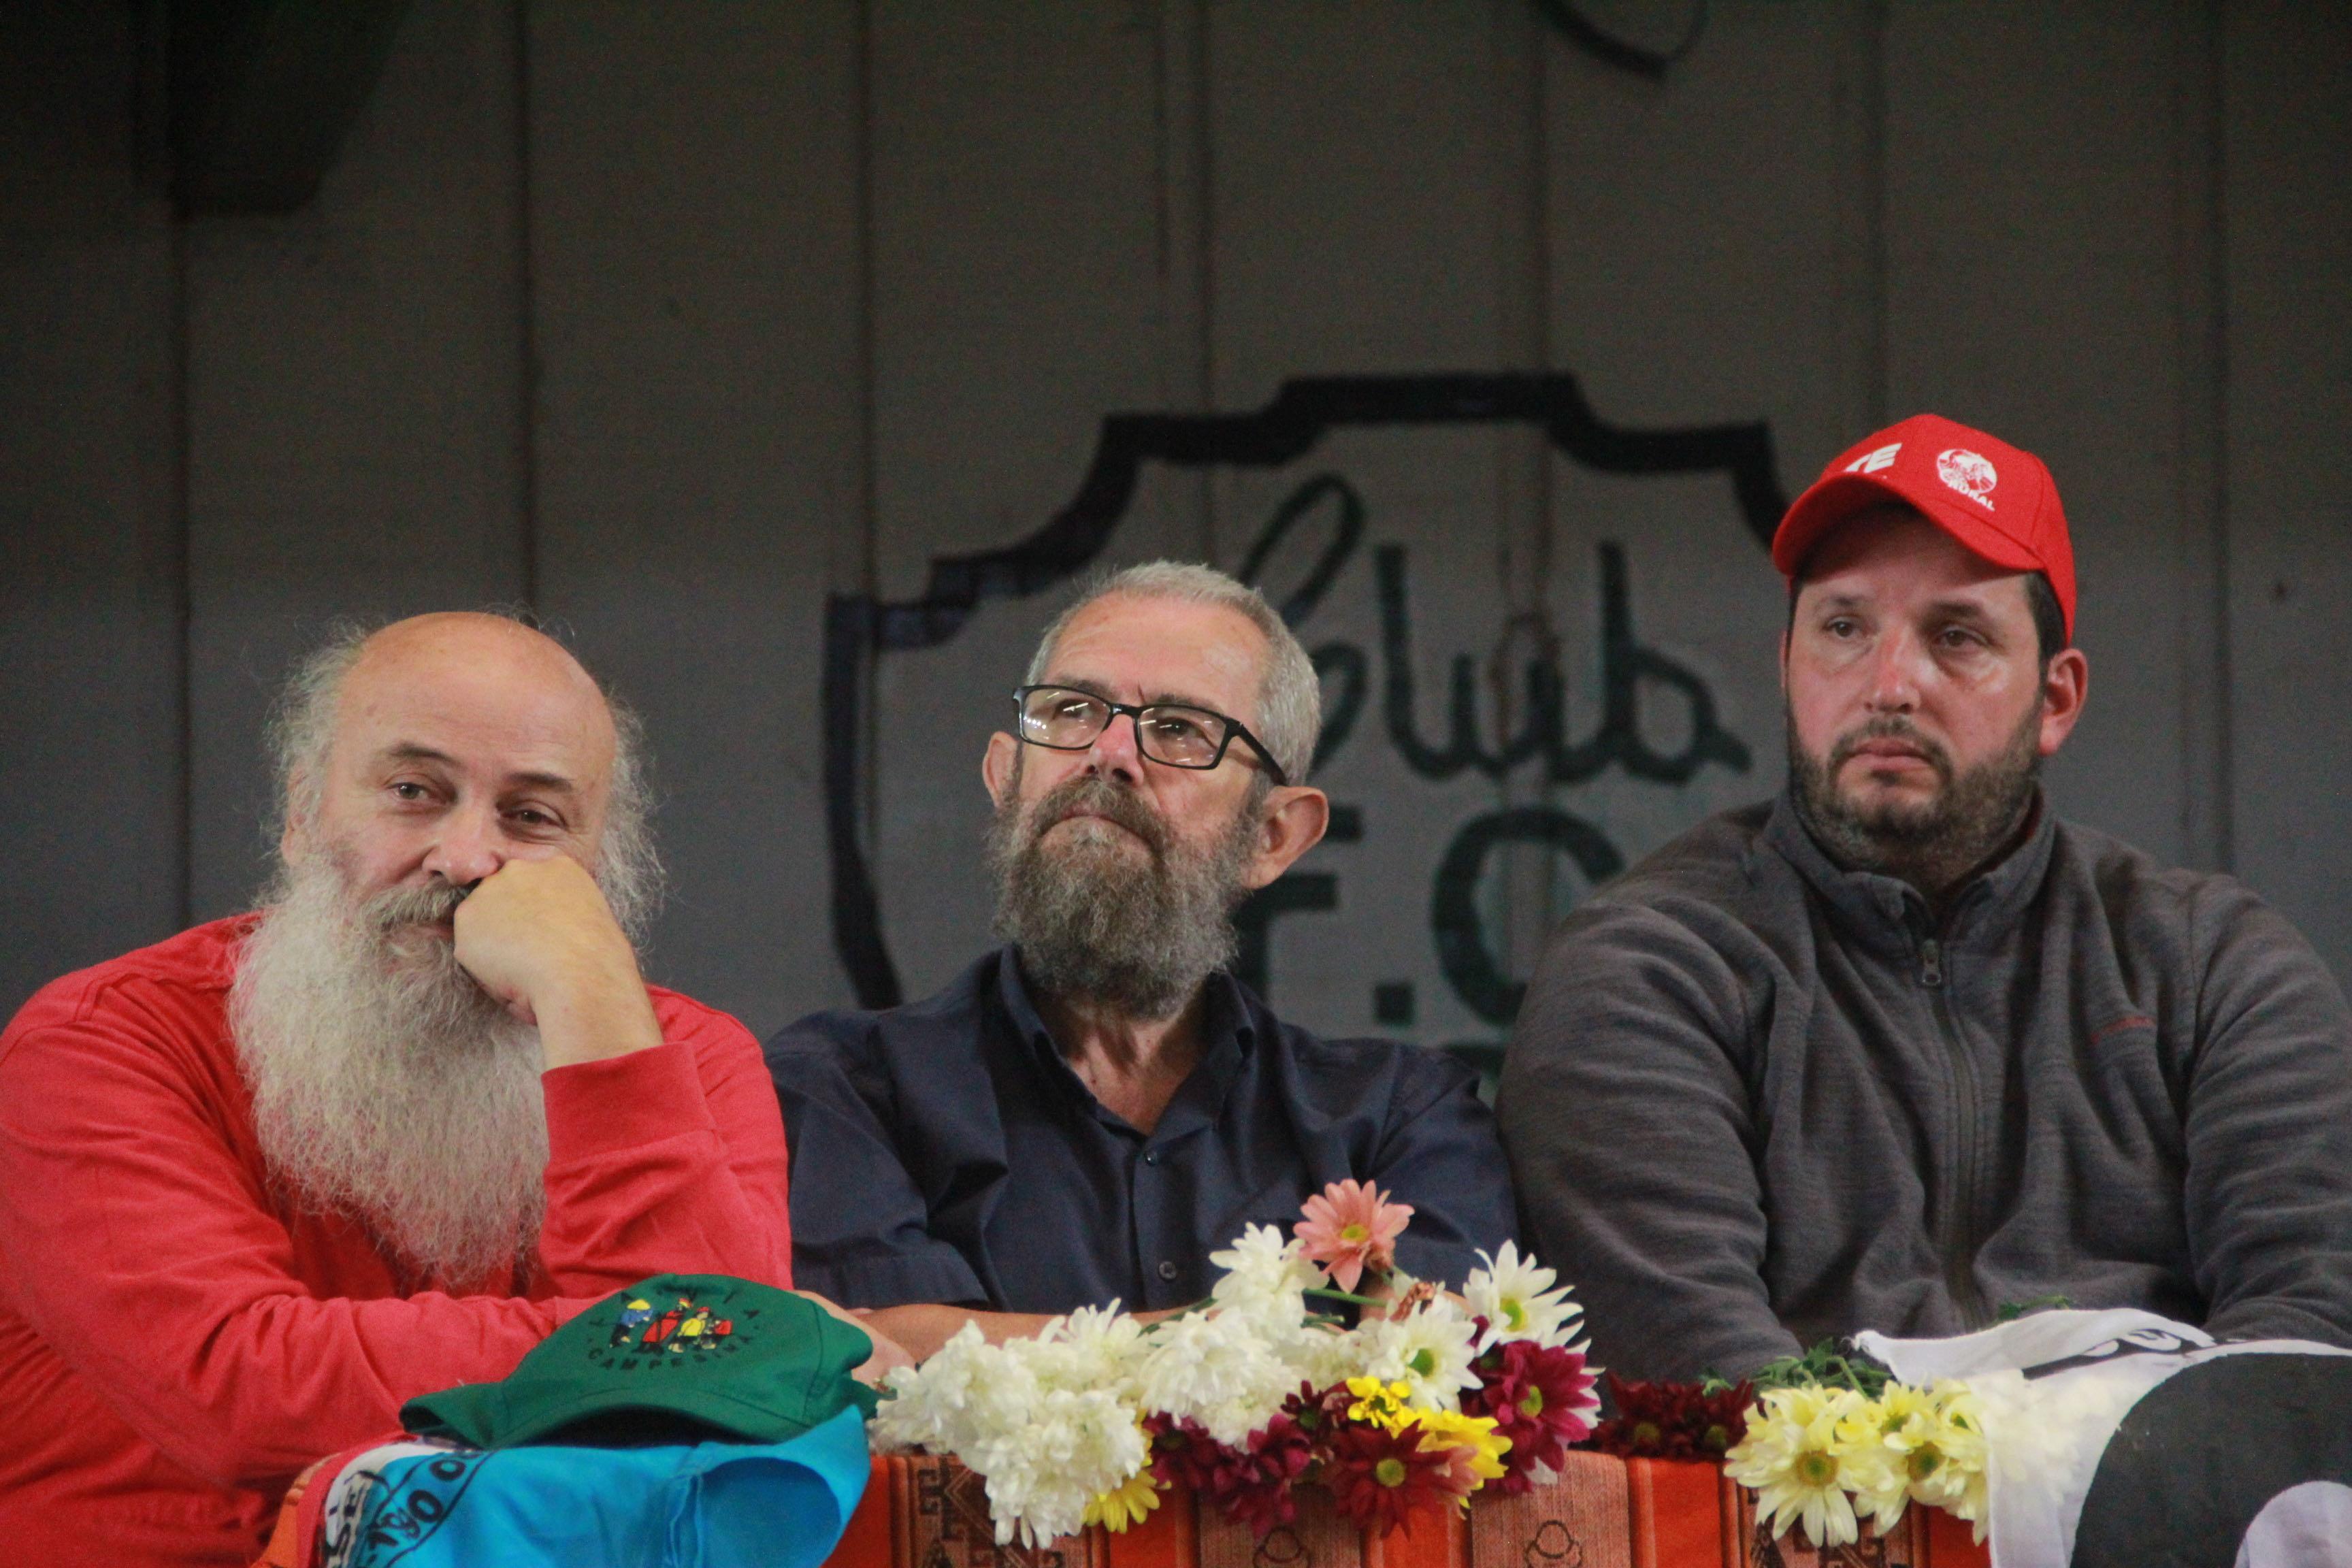 Emilio Persico, Guillermo Martini y Lautaro Benato(1)